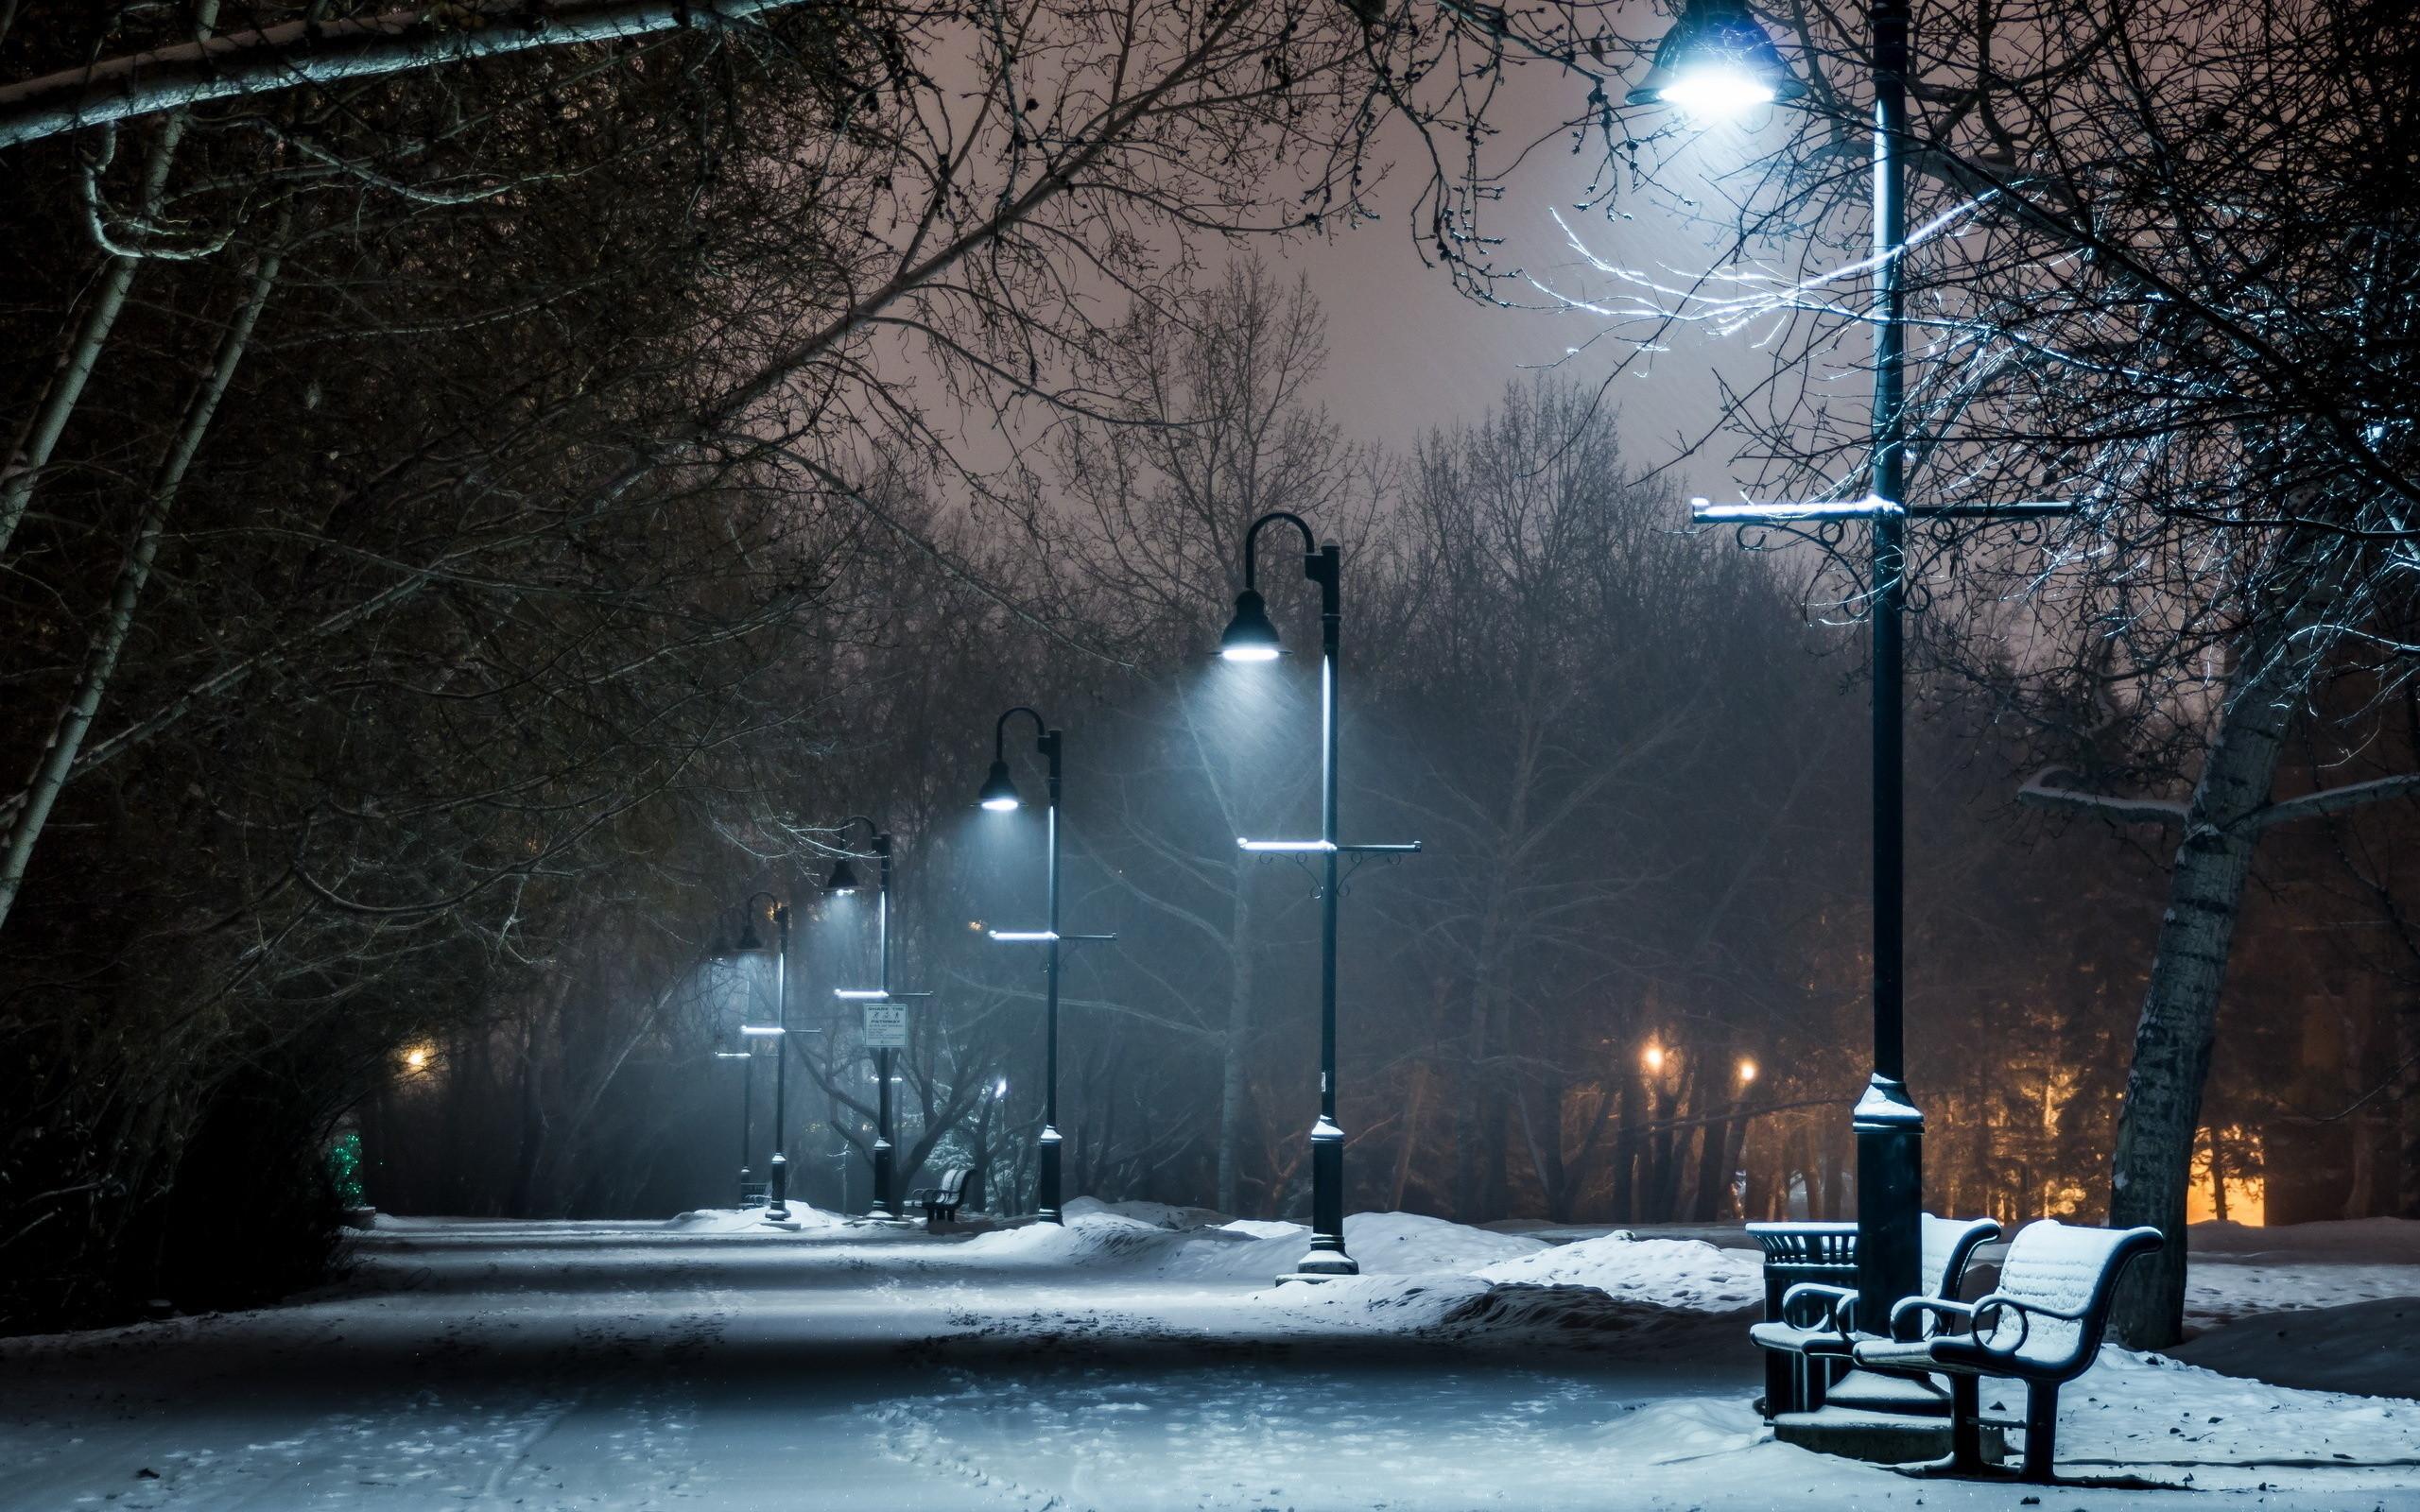 Park At Winter Night wallpaper free